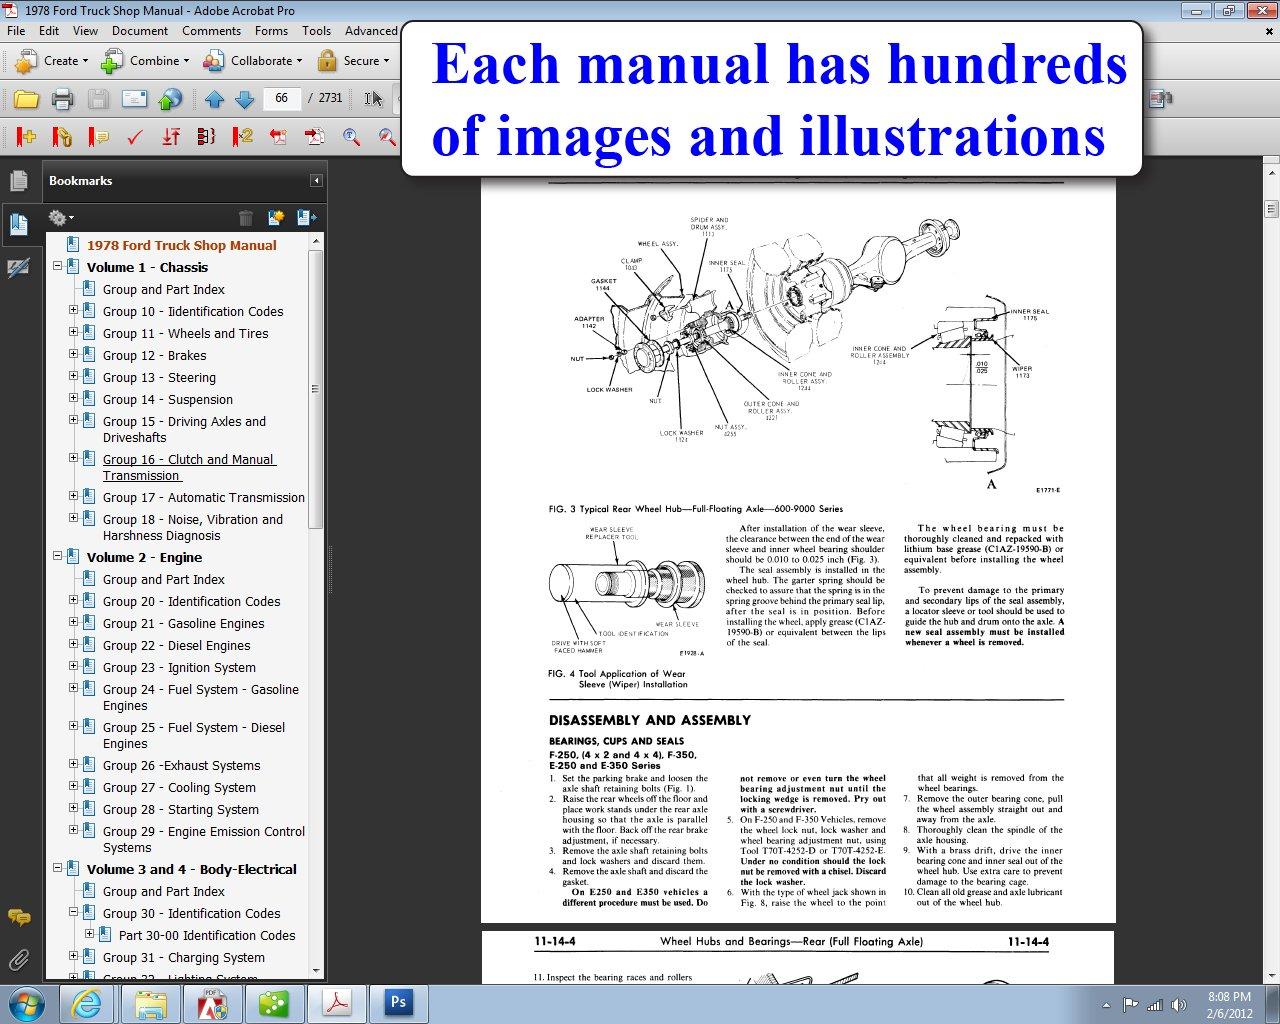 1978 ford truck shop manual ford motor company david e leblanc rh amazon com Ford Diagnostic Scanner Software Ford Diagnostic Software